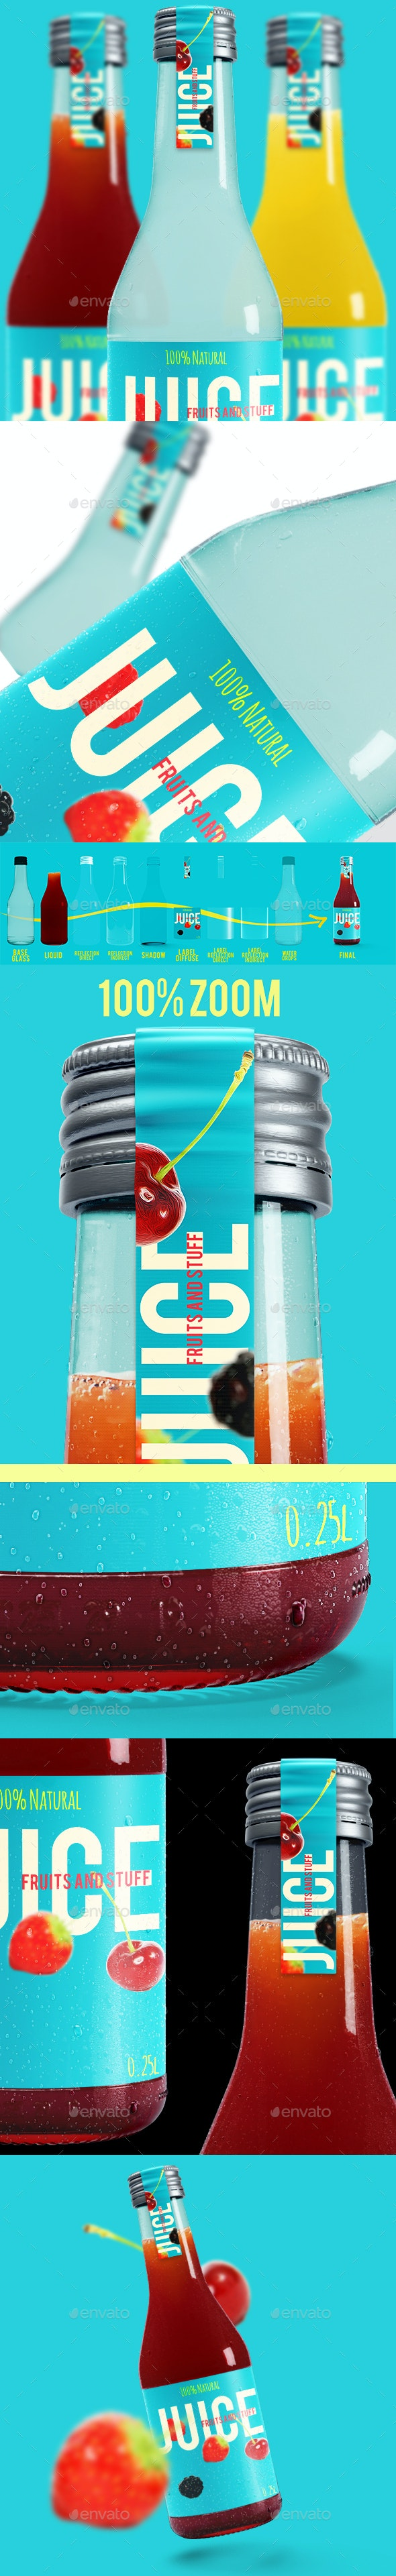 Juice Glass Bottle Mockup - Product Mock-Ups Graphics